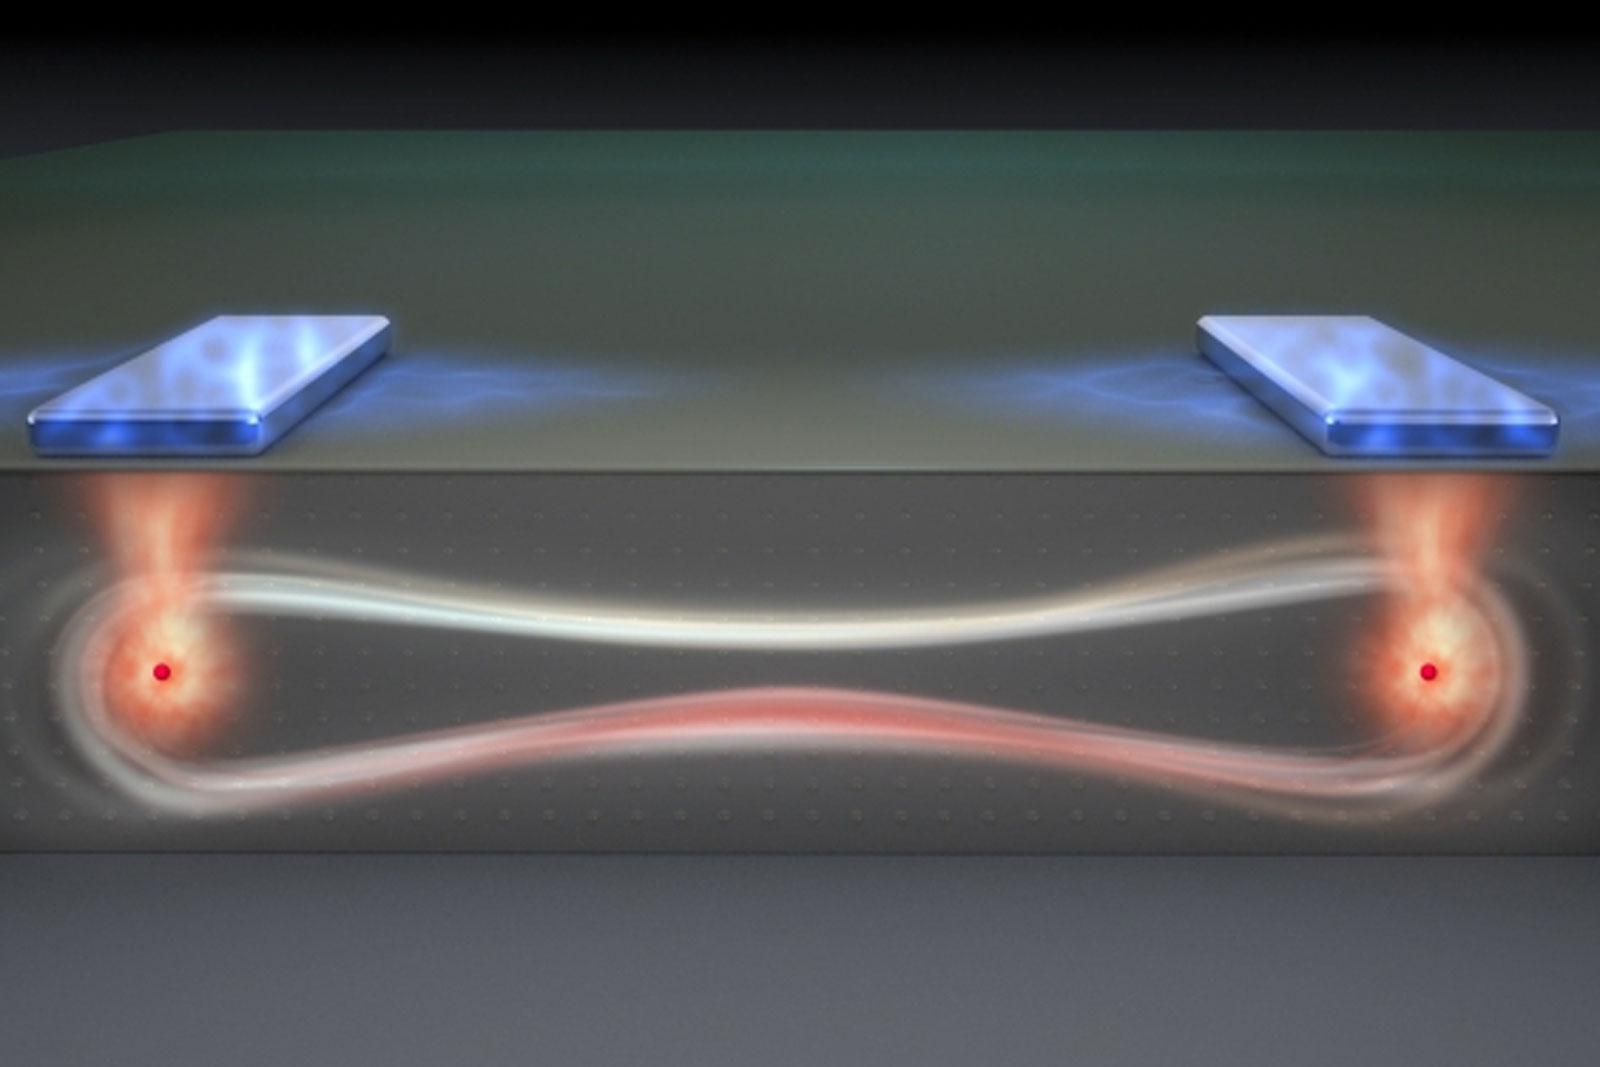 'Flip-flop' design makes quantum computers more affordable | DeviceDaily.com